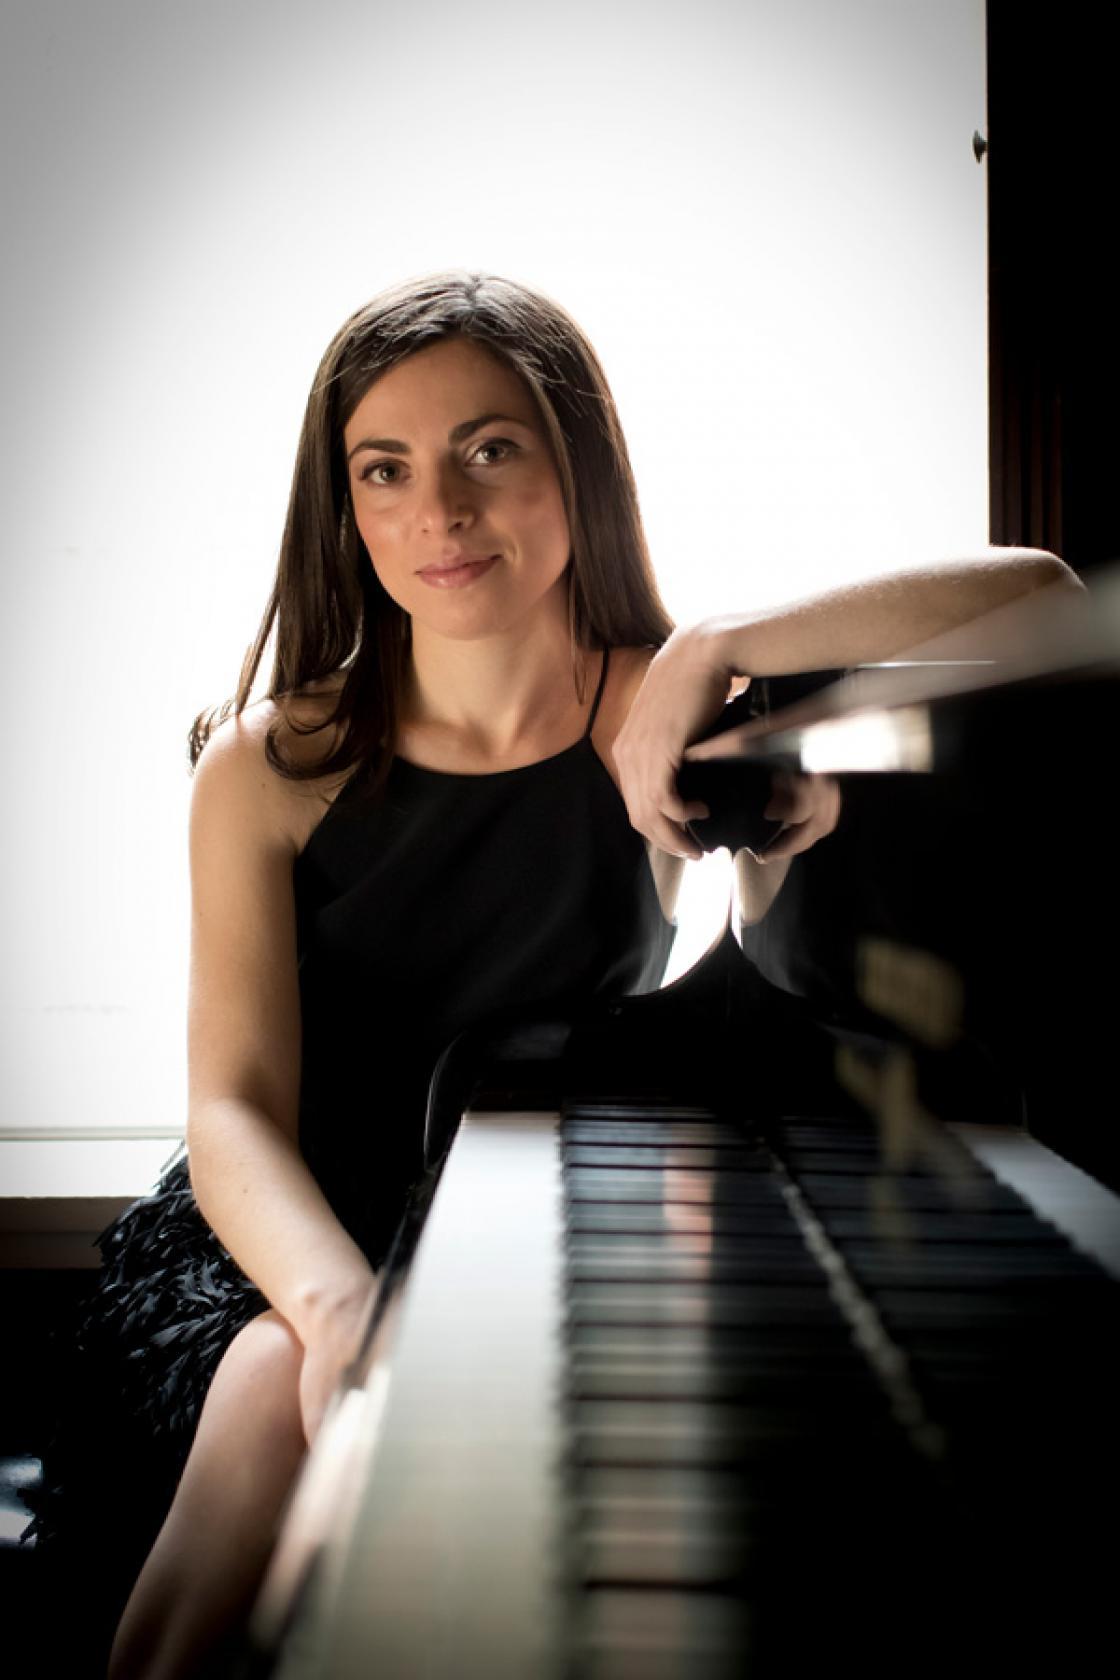 Photograph of pianist Natalia Kazaryan by Ryan Brandenberg.